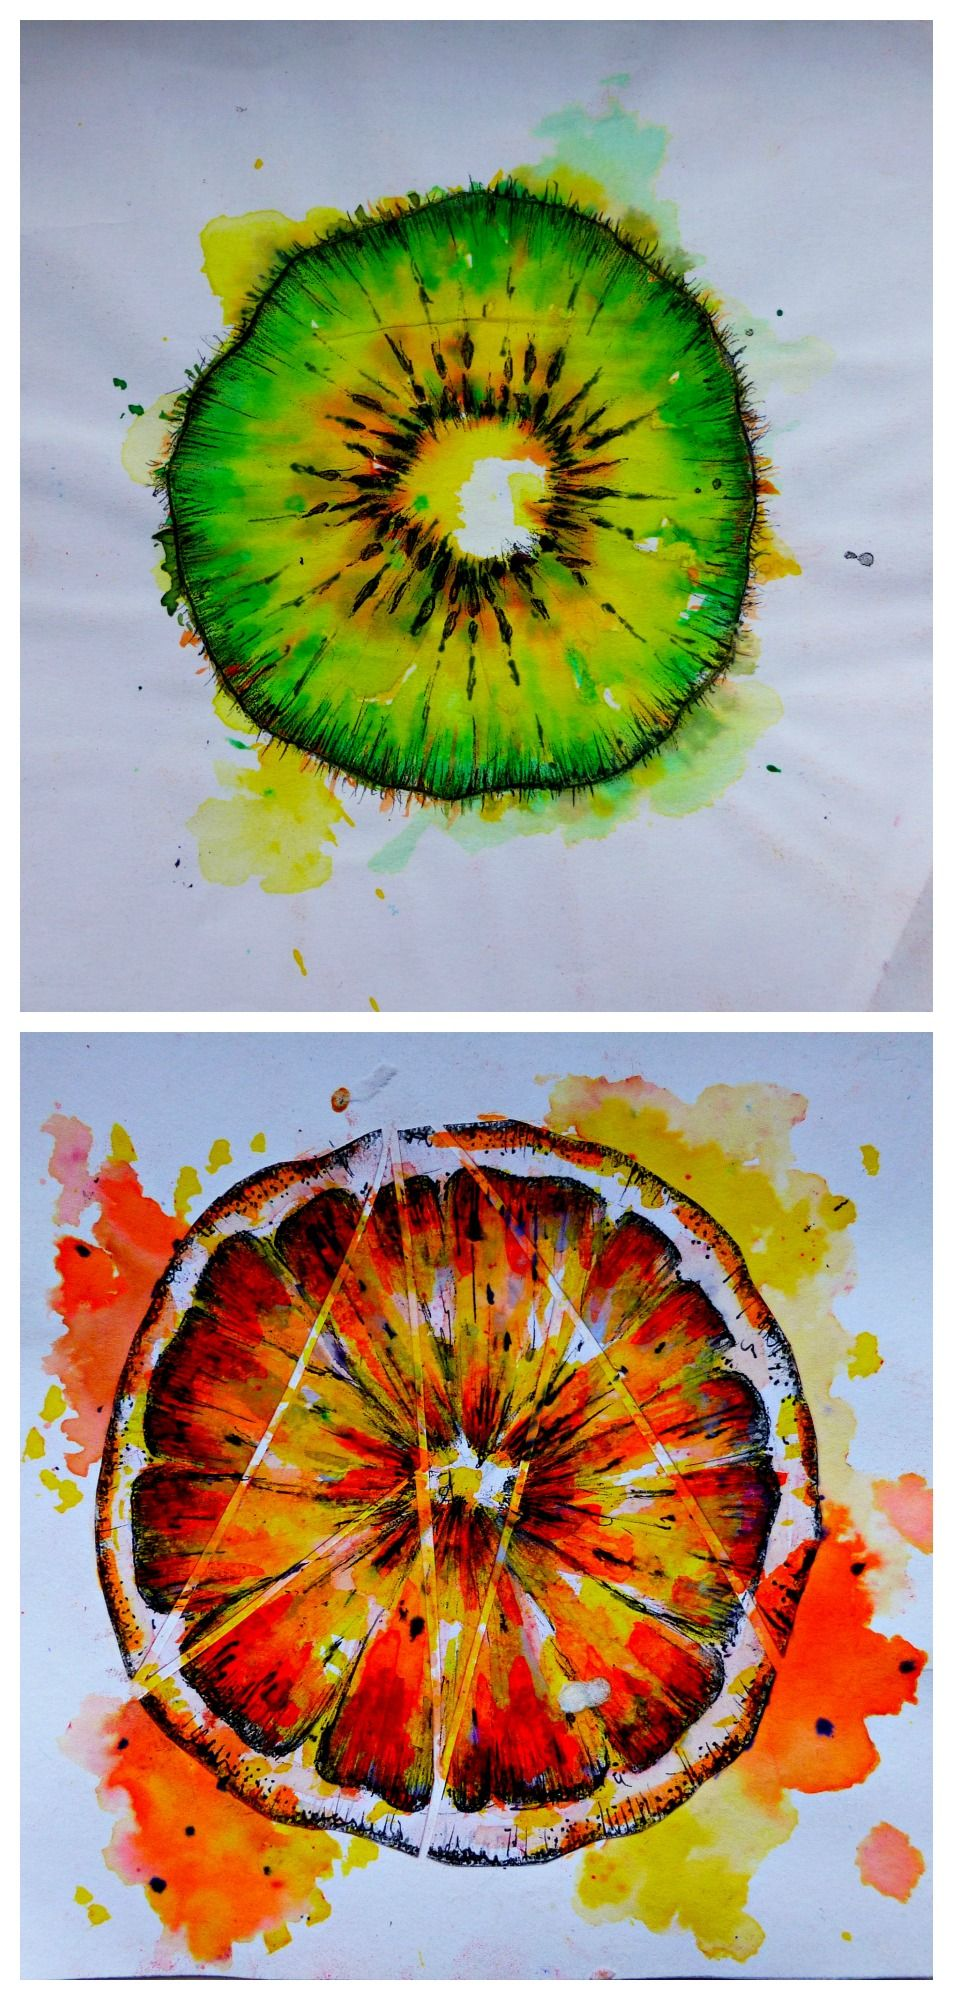 Animal Crossing Porn Orange Peel Isabell emma dibben inspired art work …   natural form art, fruit